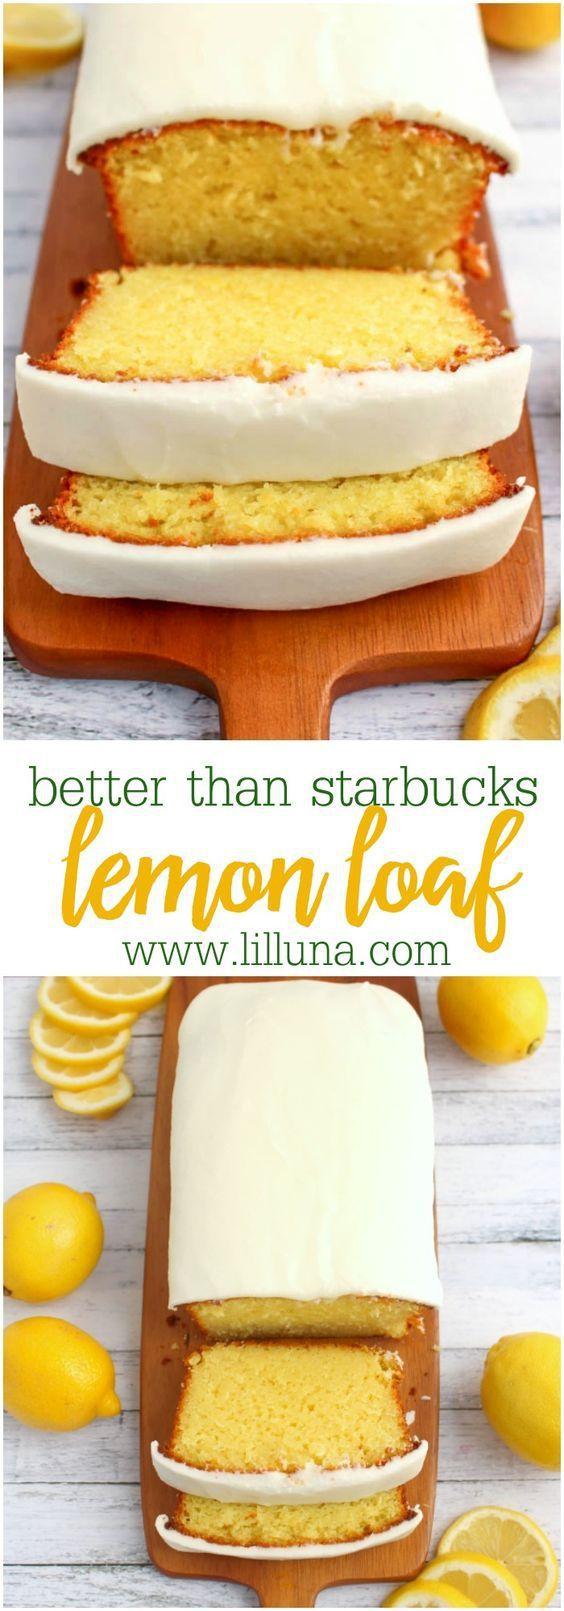 Copycat Starbuck's Lemon Loaf